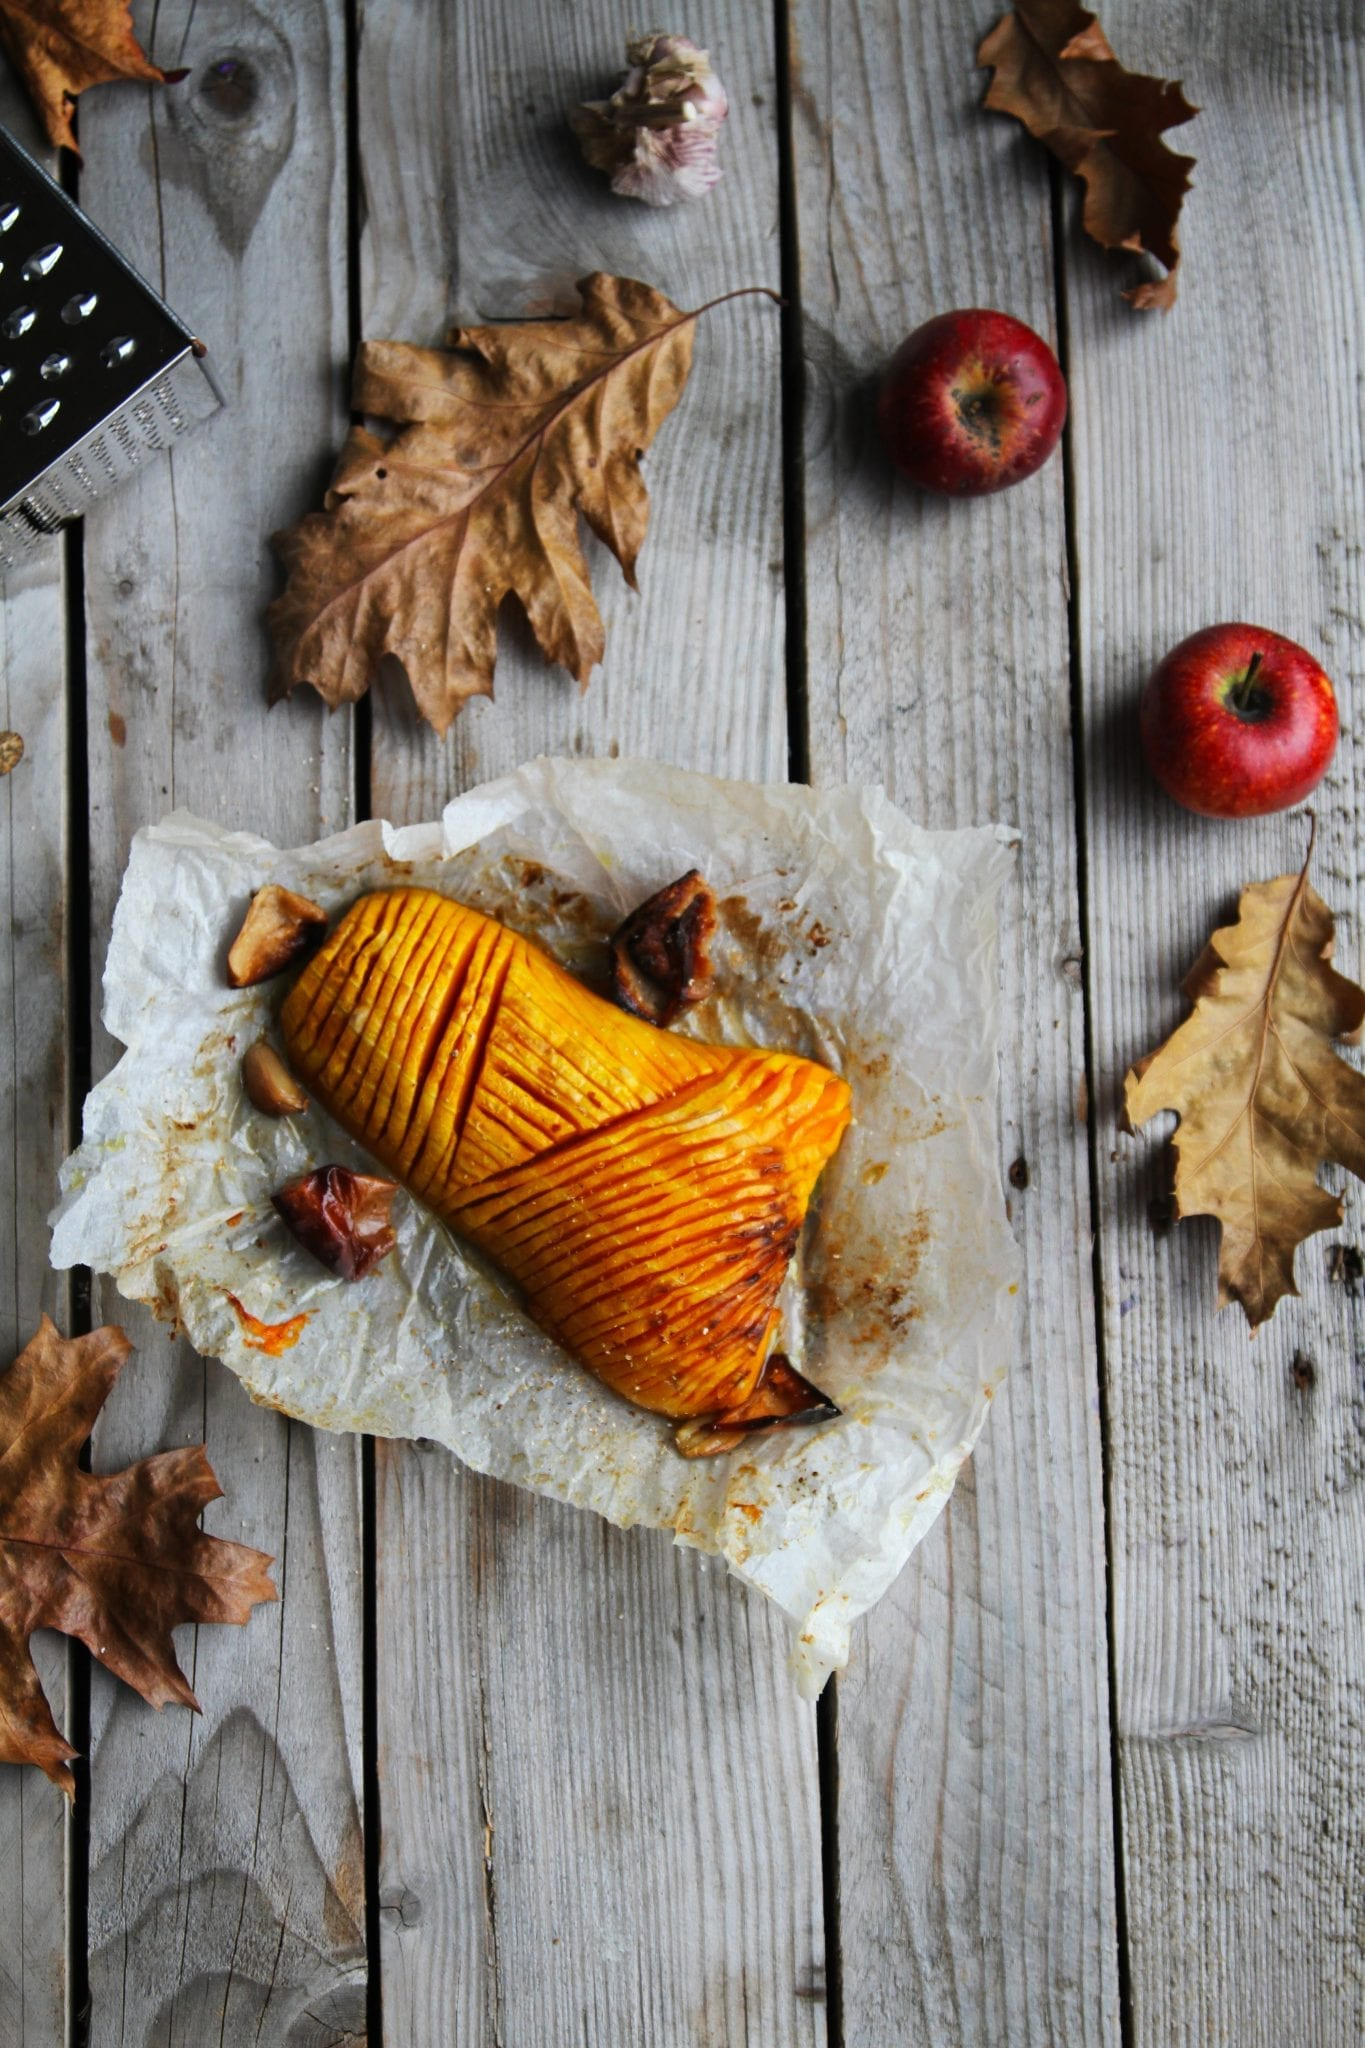 græskar Hasselback butternut squash med citronolie, hvidløg og æble